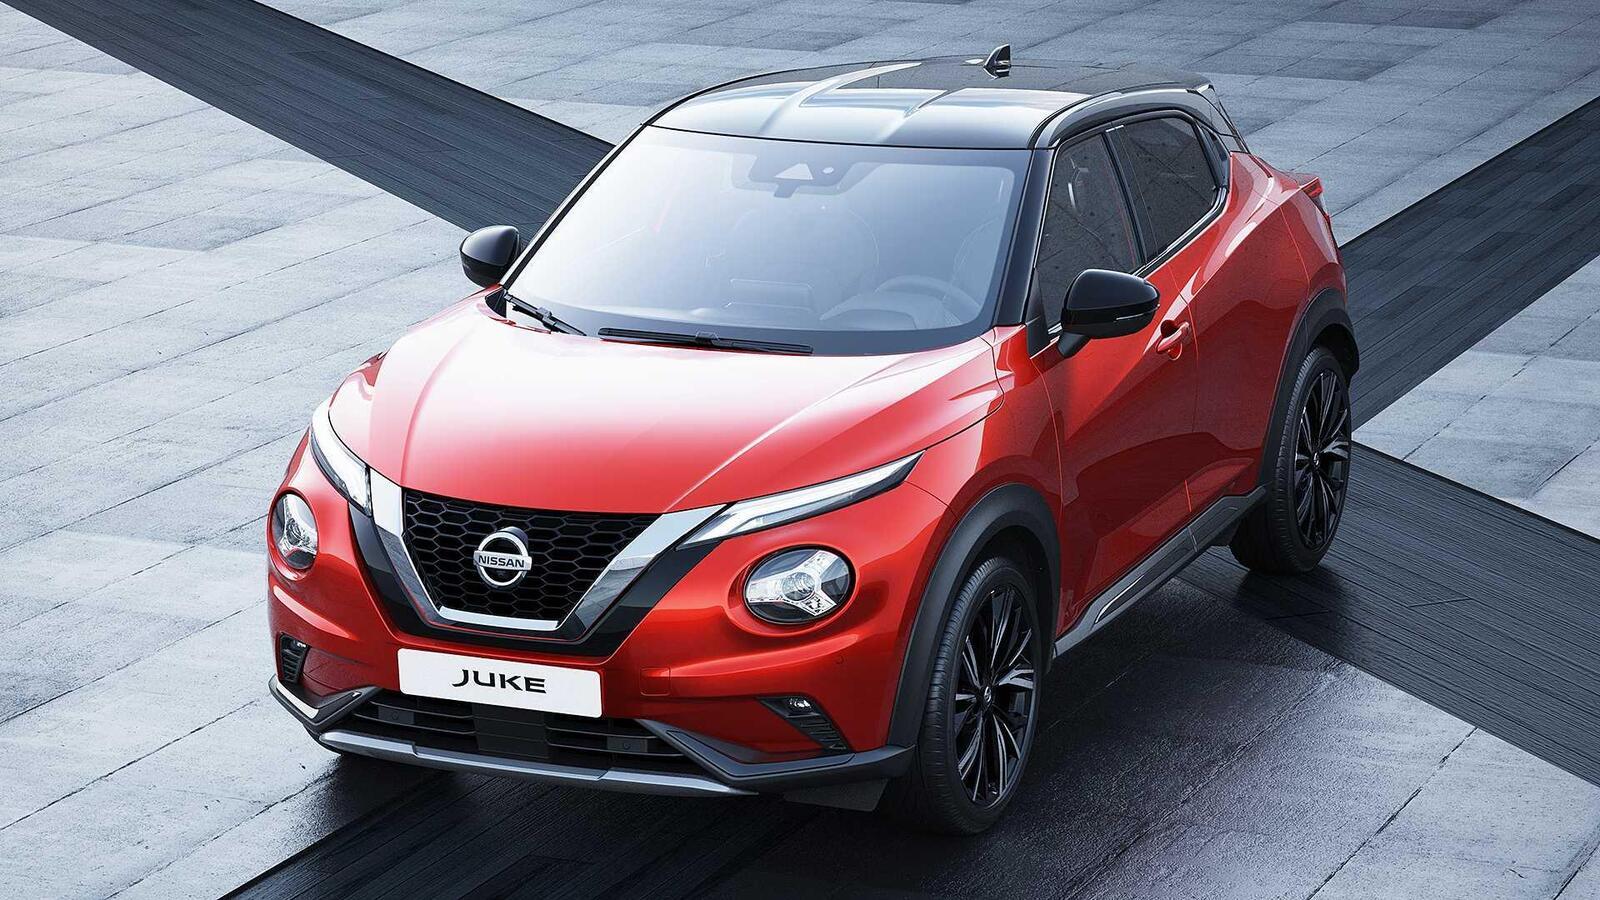 Ngoại thật Nissan Juke 2020